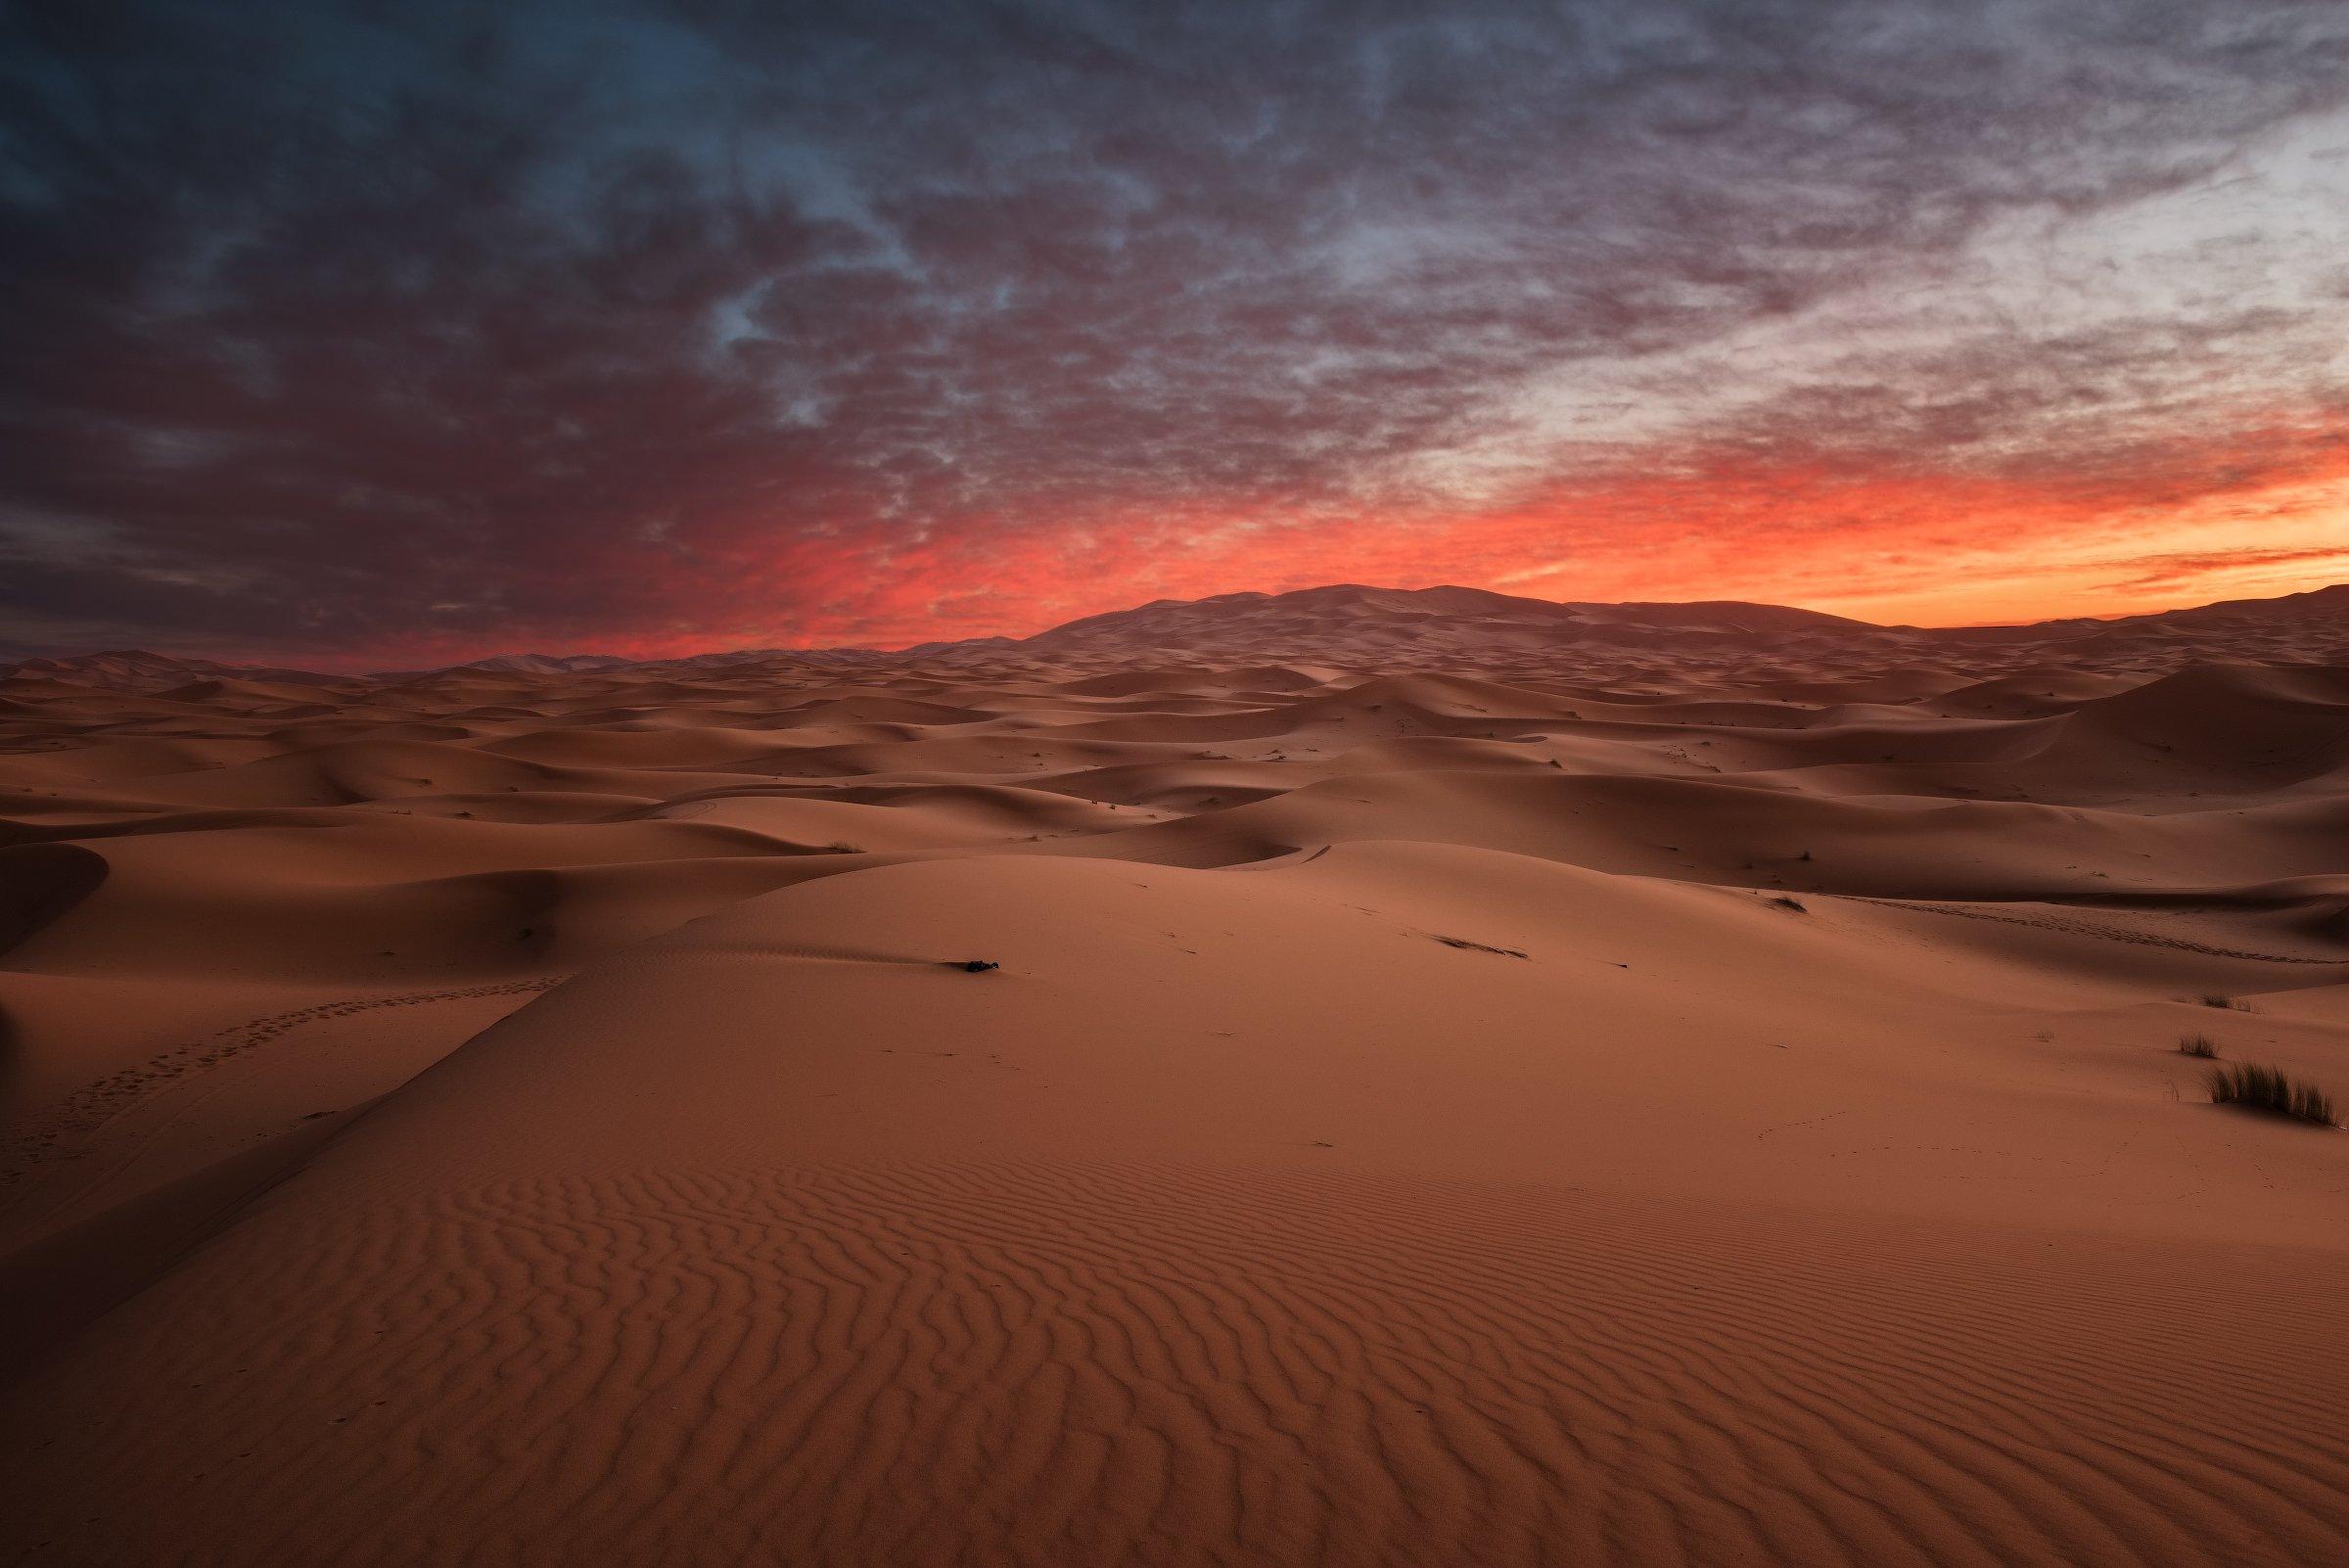 Сахара, Мерзуга, пустыня, Сергей Ершов